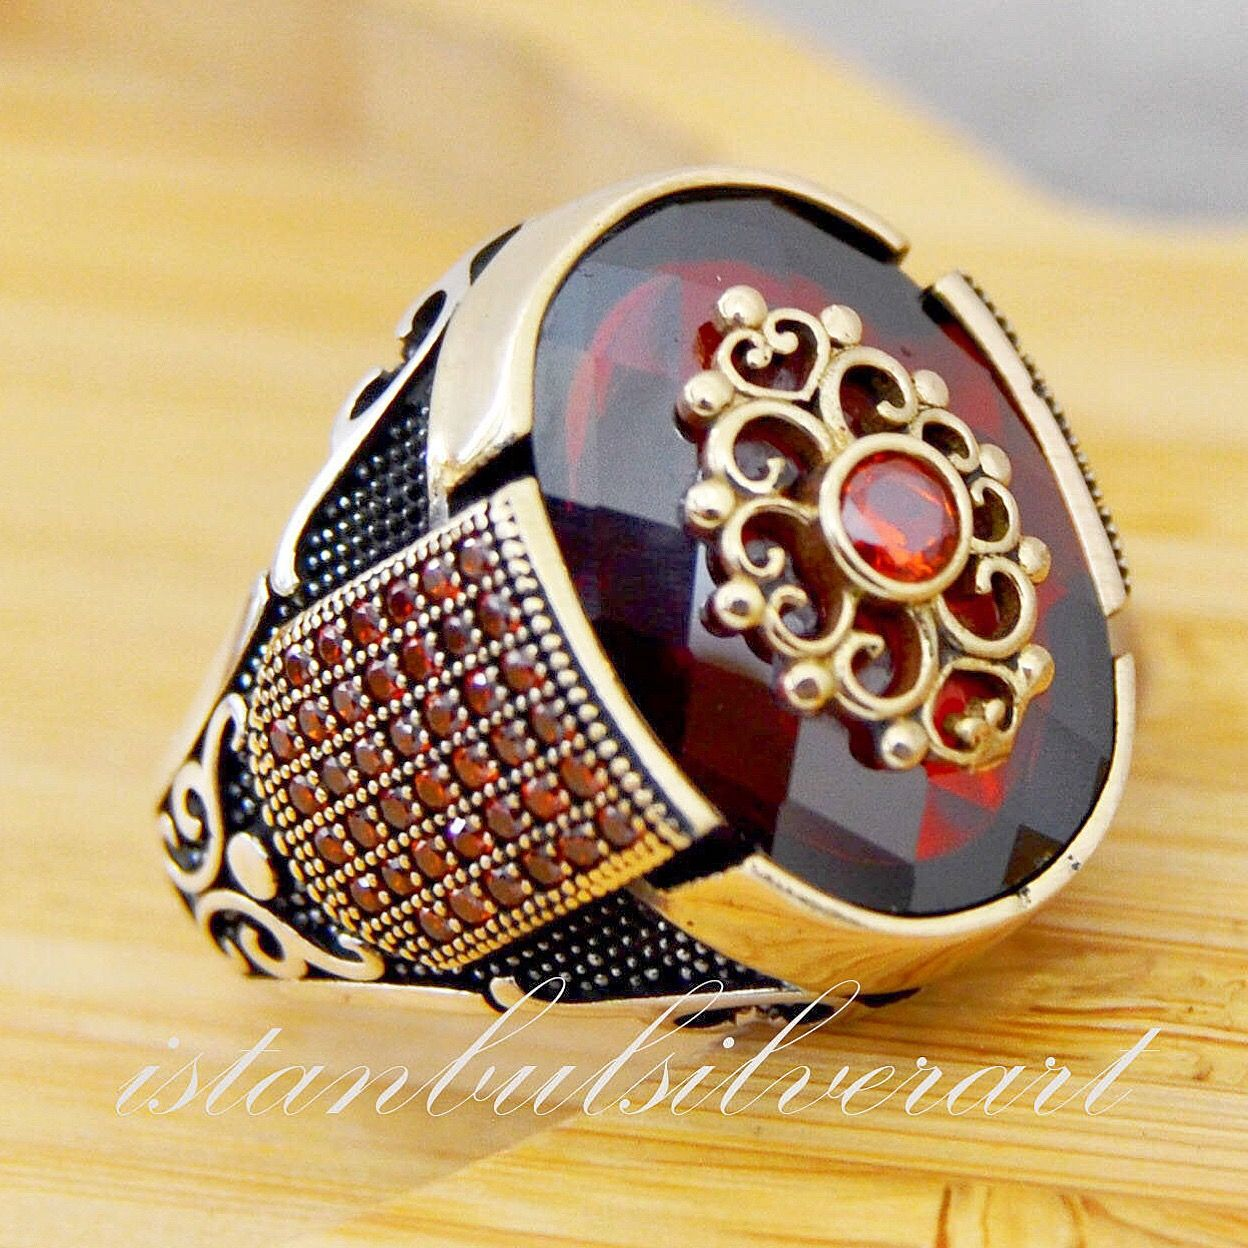 Mens Handmade Ring, Turkish Handmade Silver Men Ring, Ottoman Mens Ring, Ruby, cubic zircon stone, Gift for Him, 925k Sterling Silver Ring